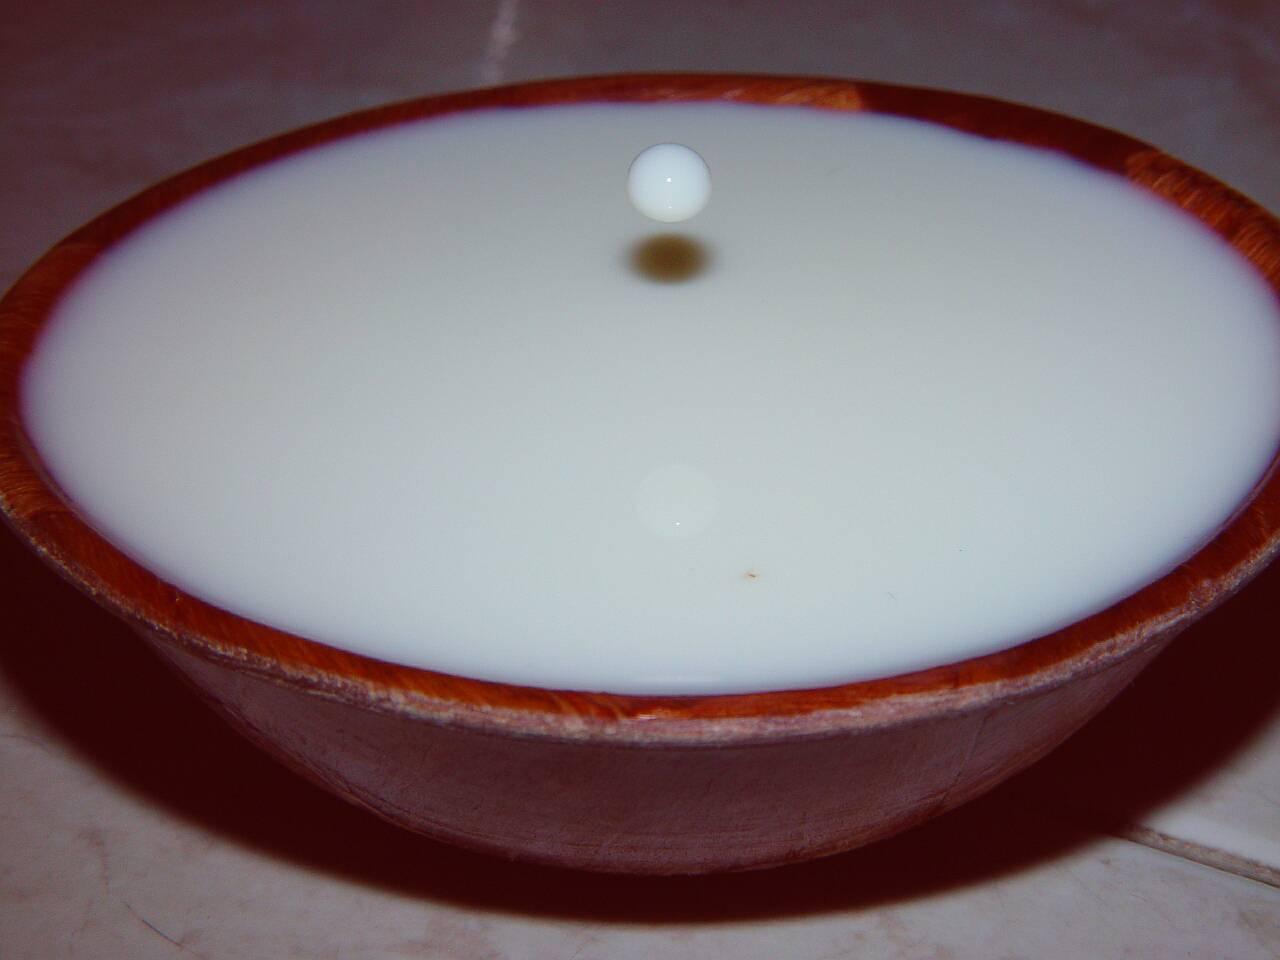 Dror Bar-Natan's Image Gallery: Miscellaneous: Milk Drops ...